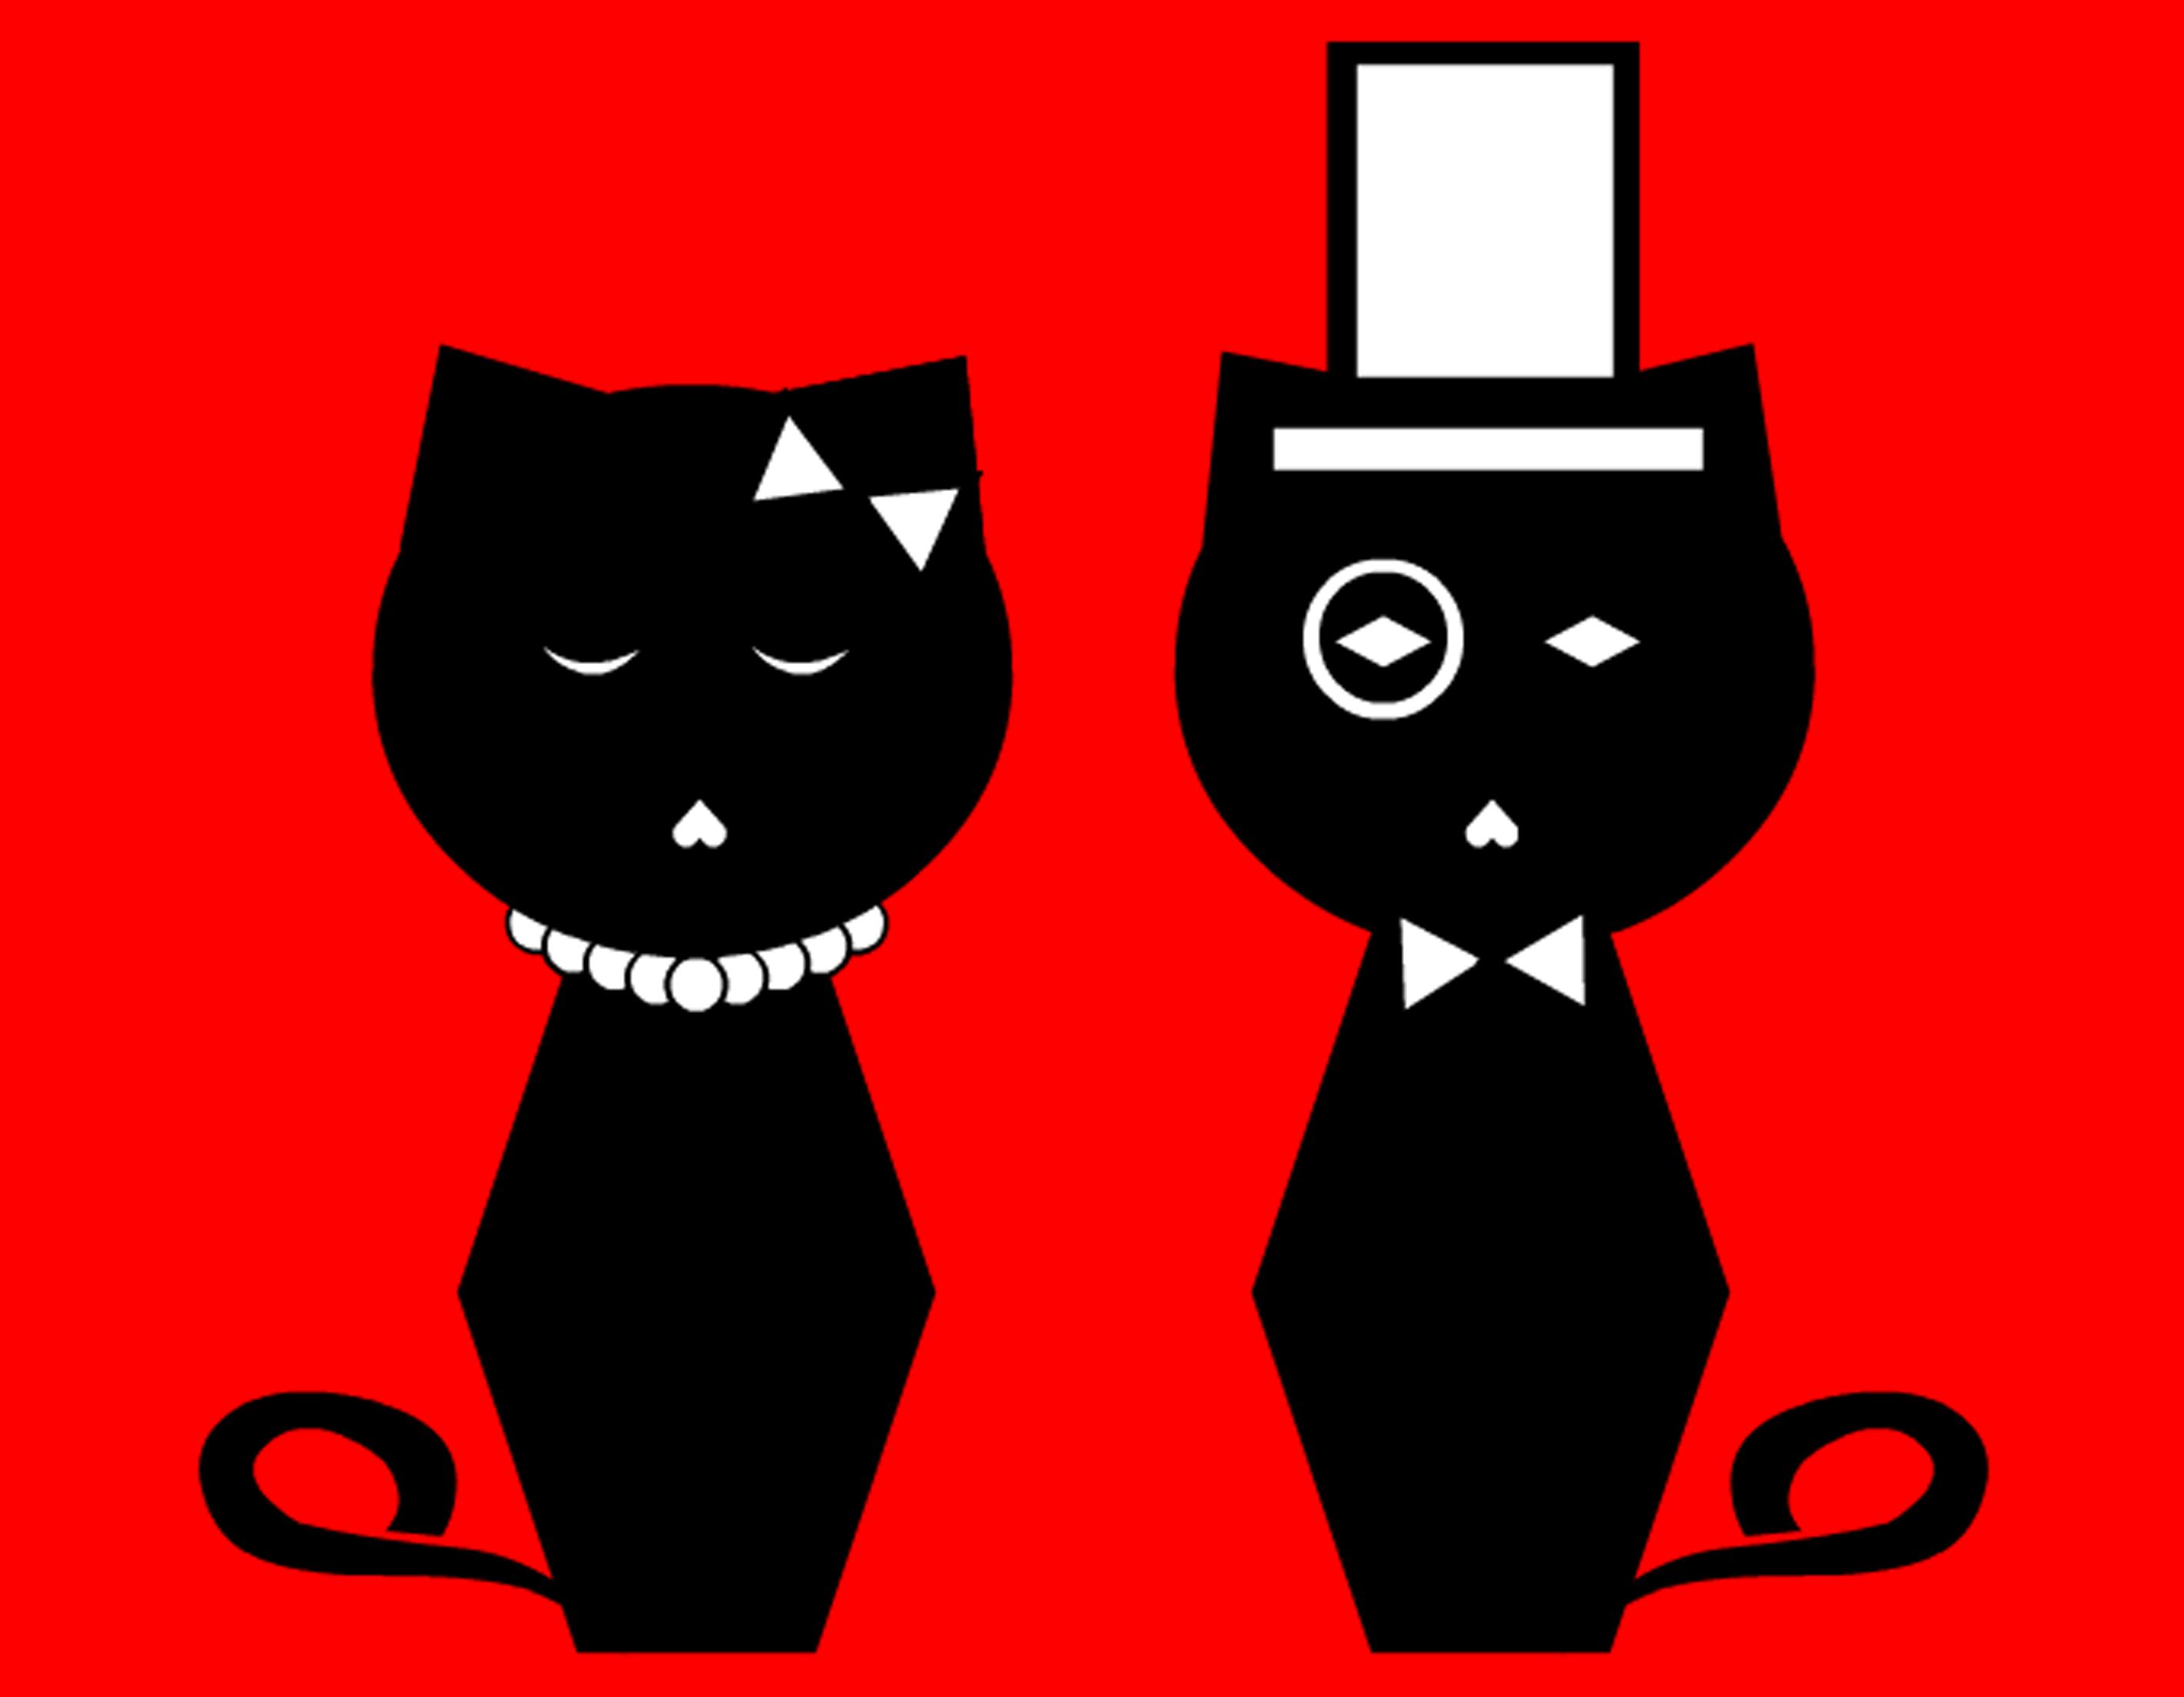 The Noodle Kittens Kitten